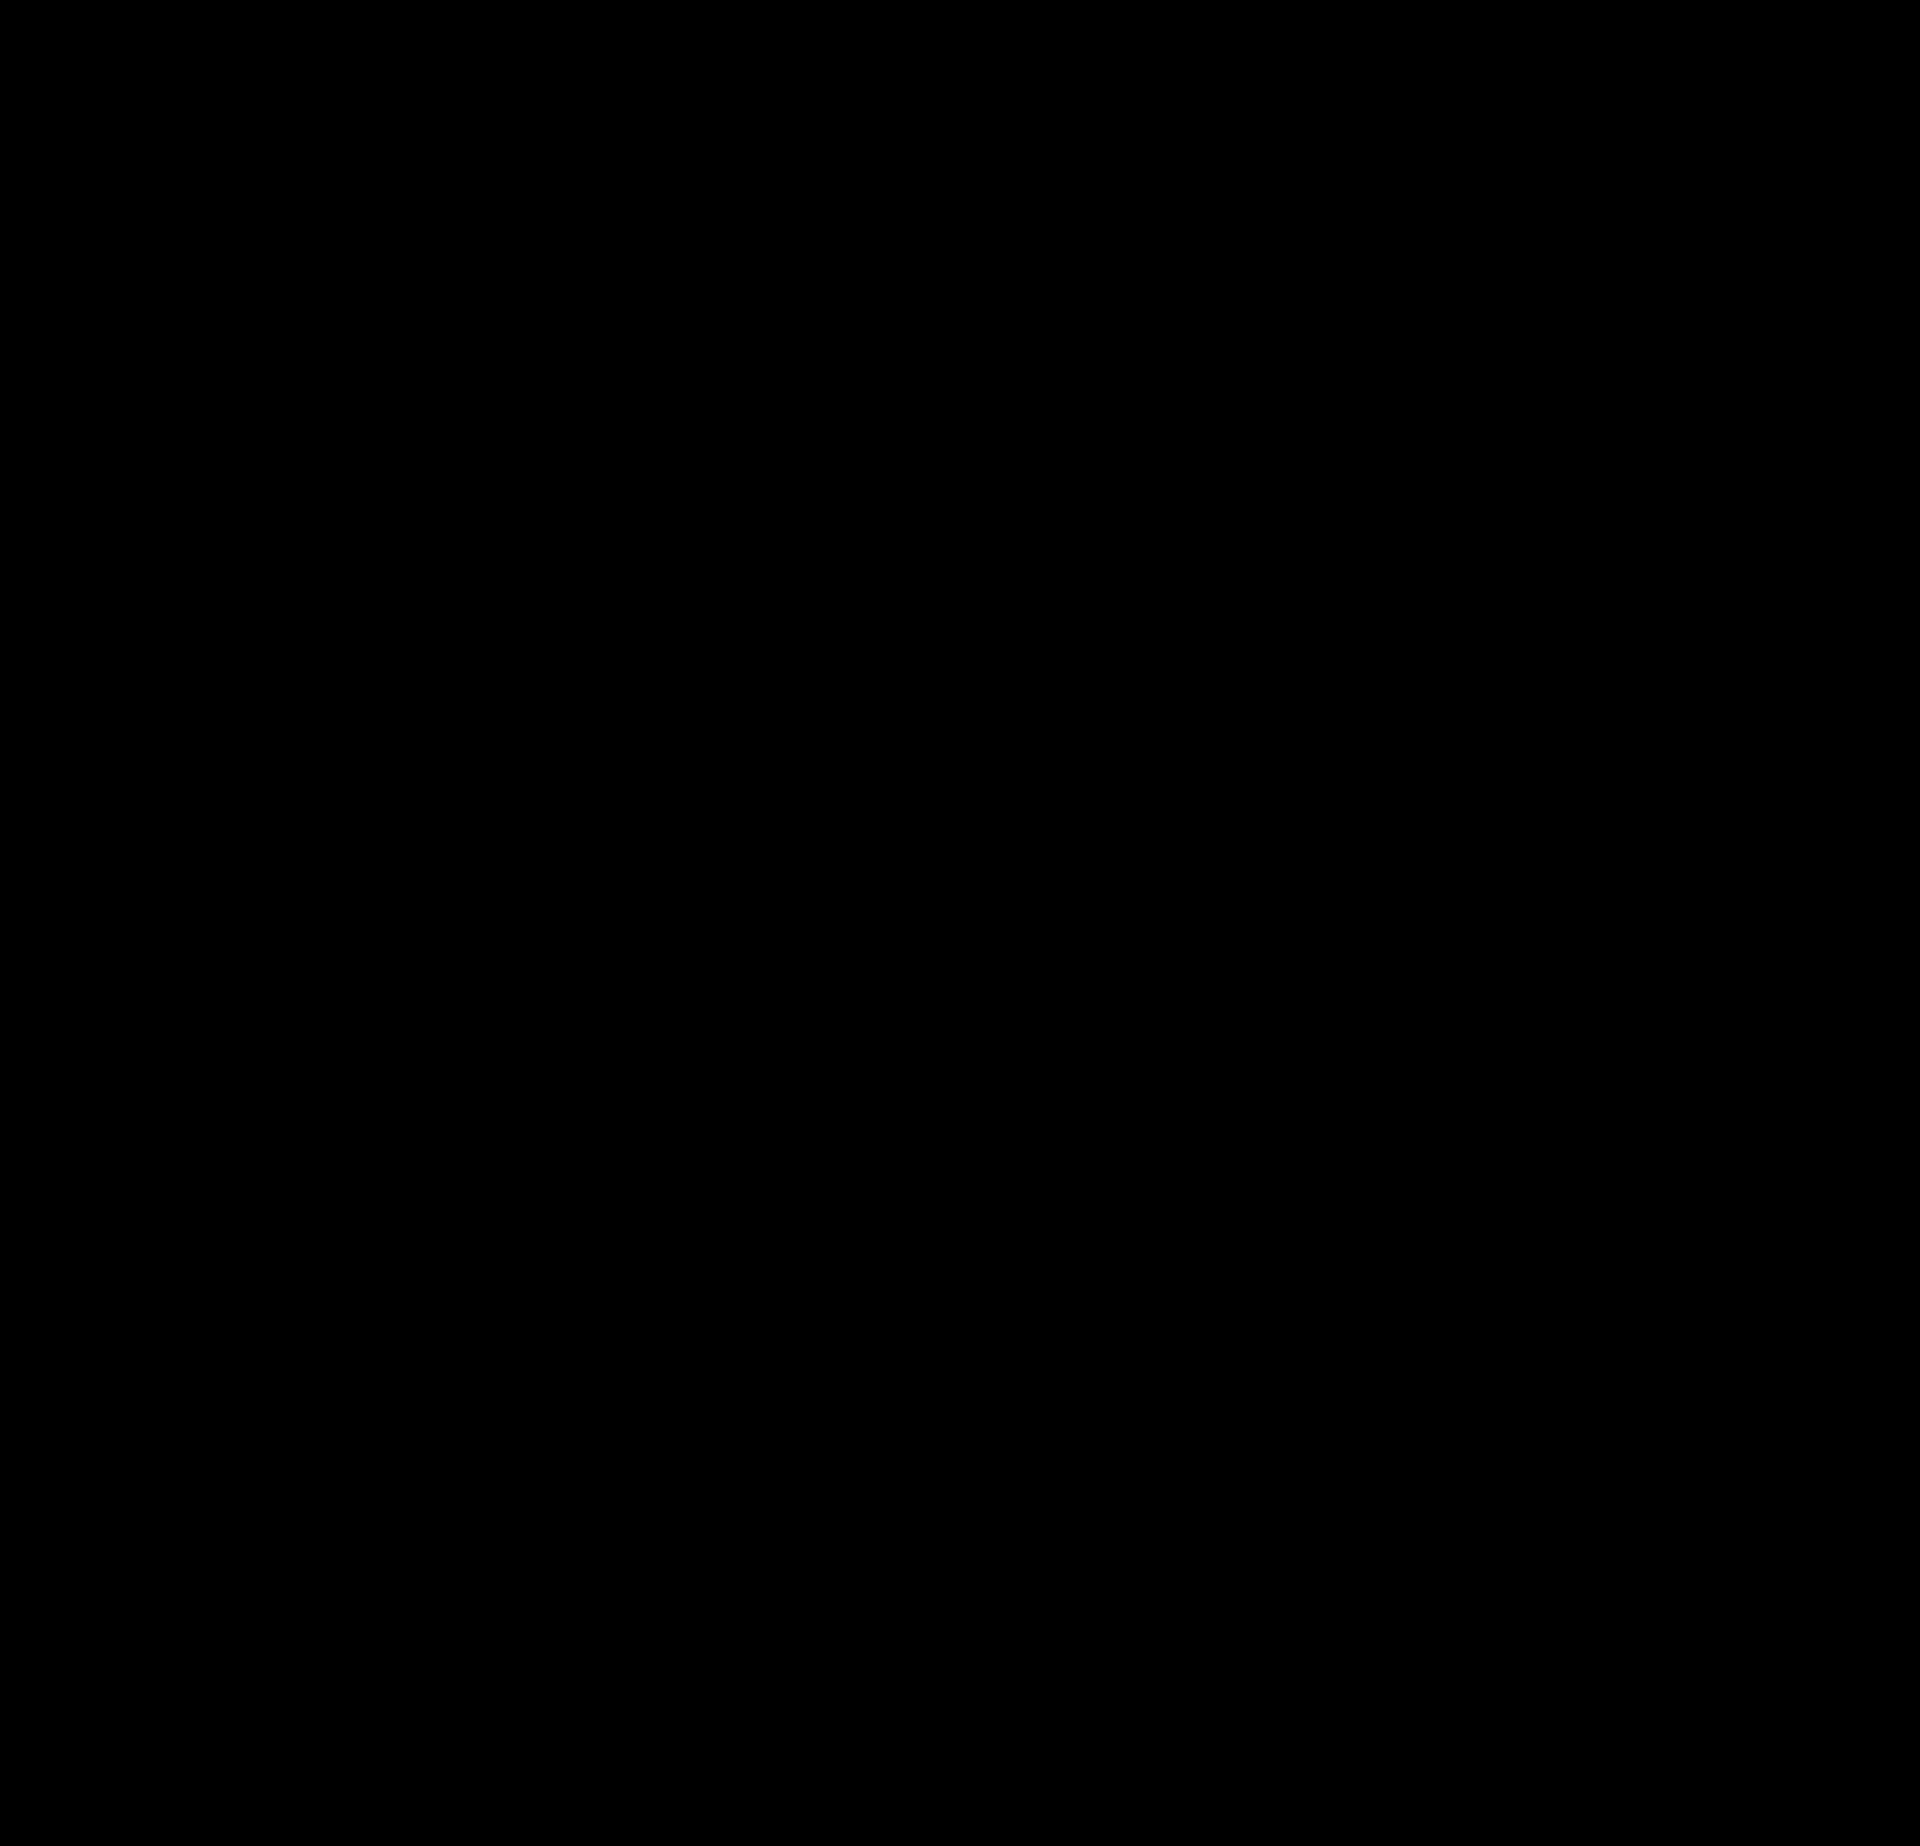 user-icon-2098873_1920